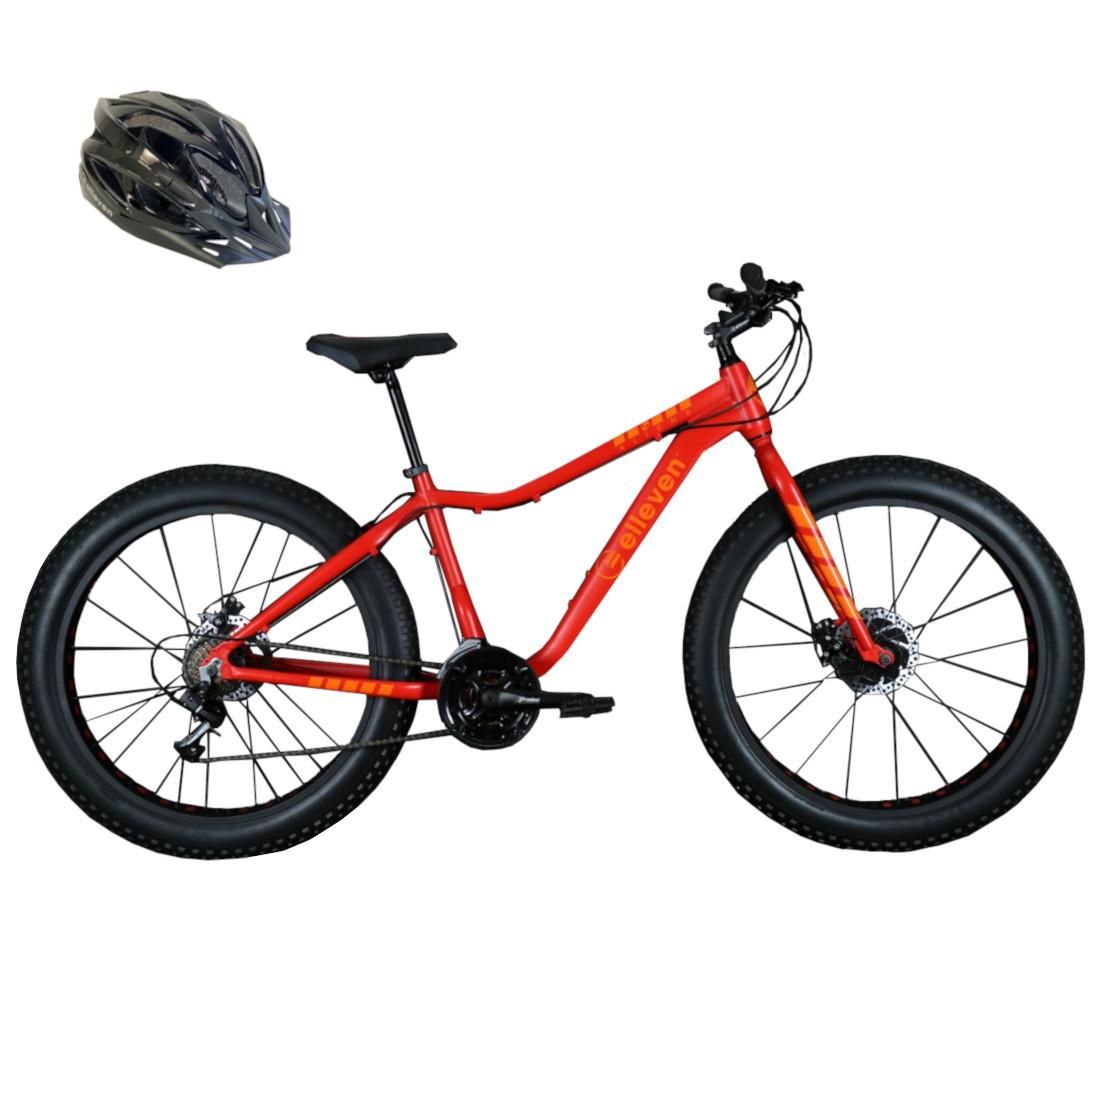 Bicicleta Fat Bike Pneu Largo Aro 26 21V Laranja com Capacete